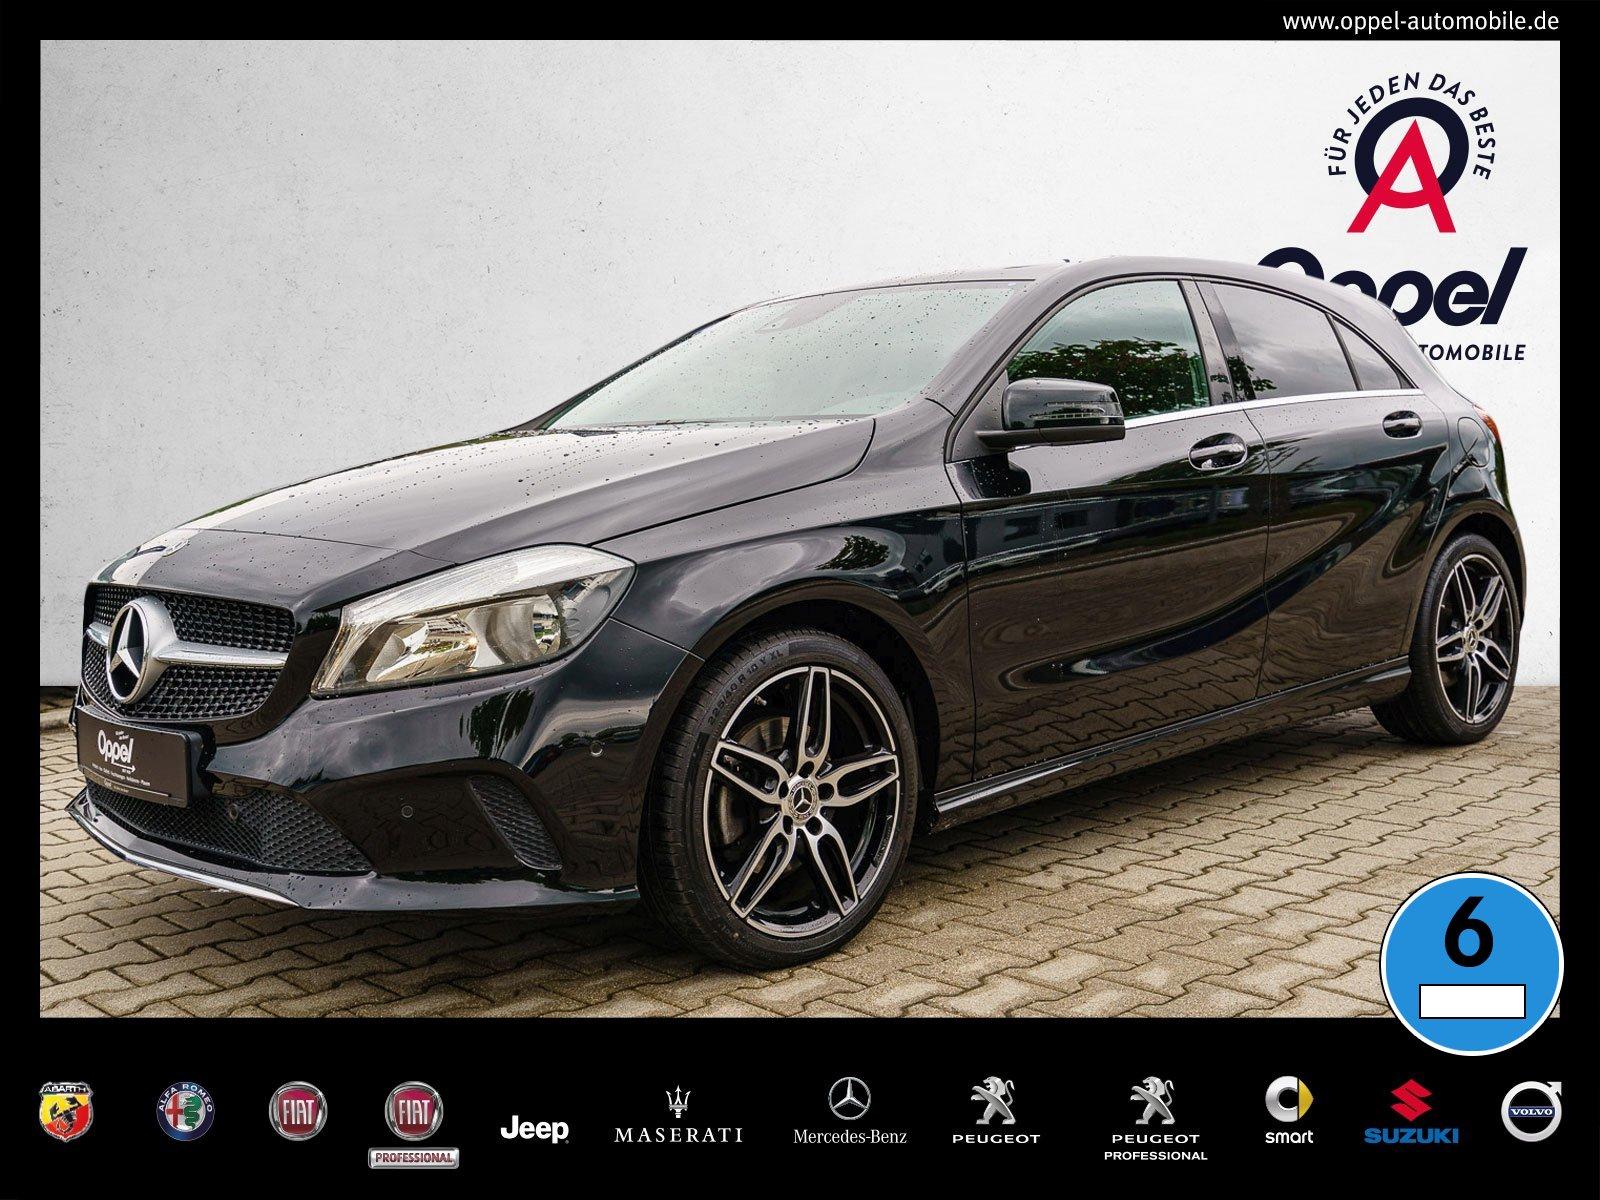 Mercedes-Benz A 220 4M URBAN+NAVI+KAMERA+PTS+TEMPOMAT+SITZHEI., Jahr 2017, Benzin